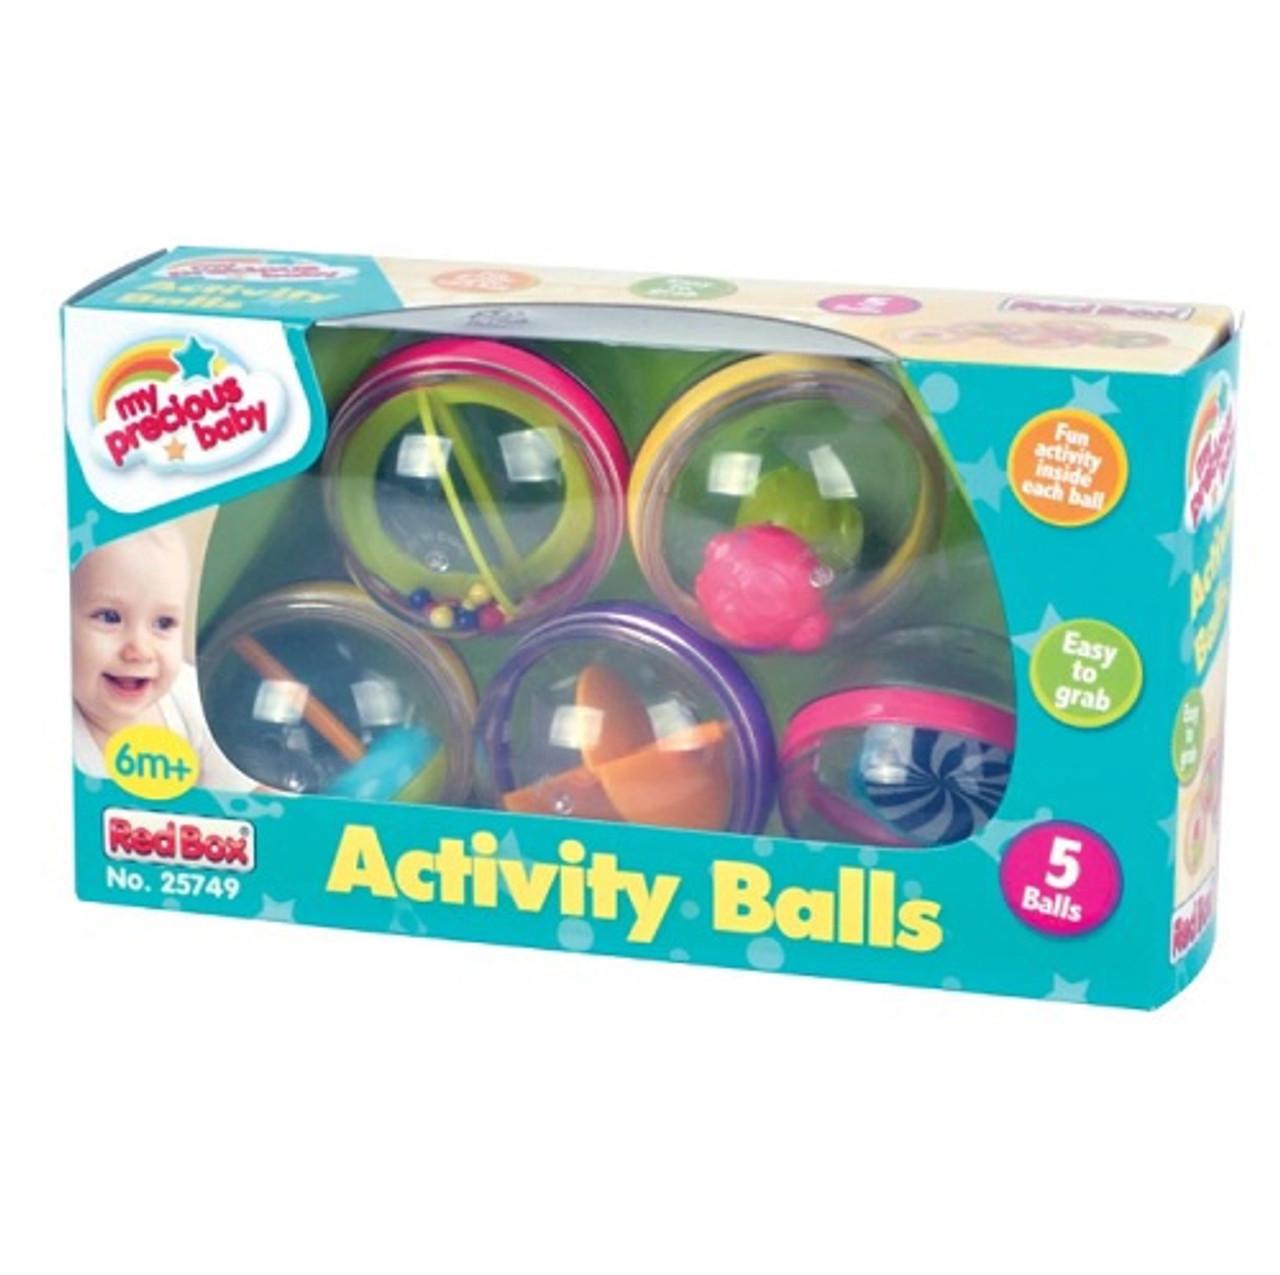 ACTIVITY BALL 5PCS